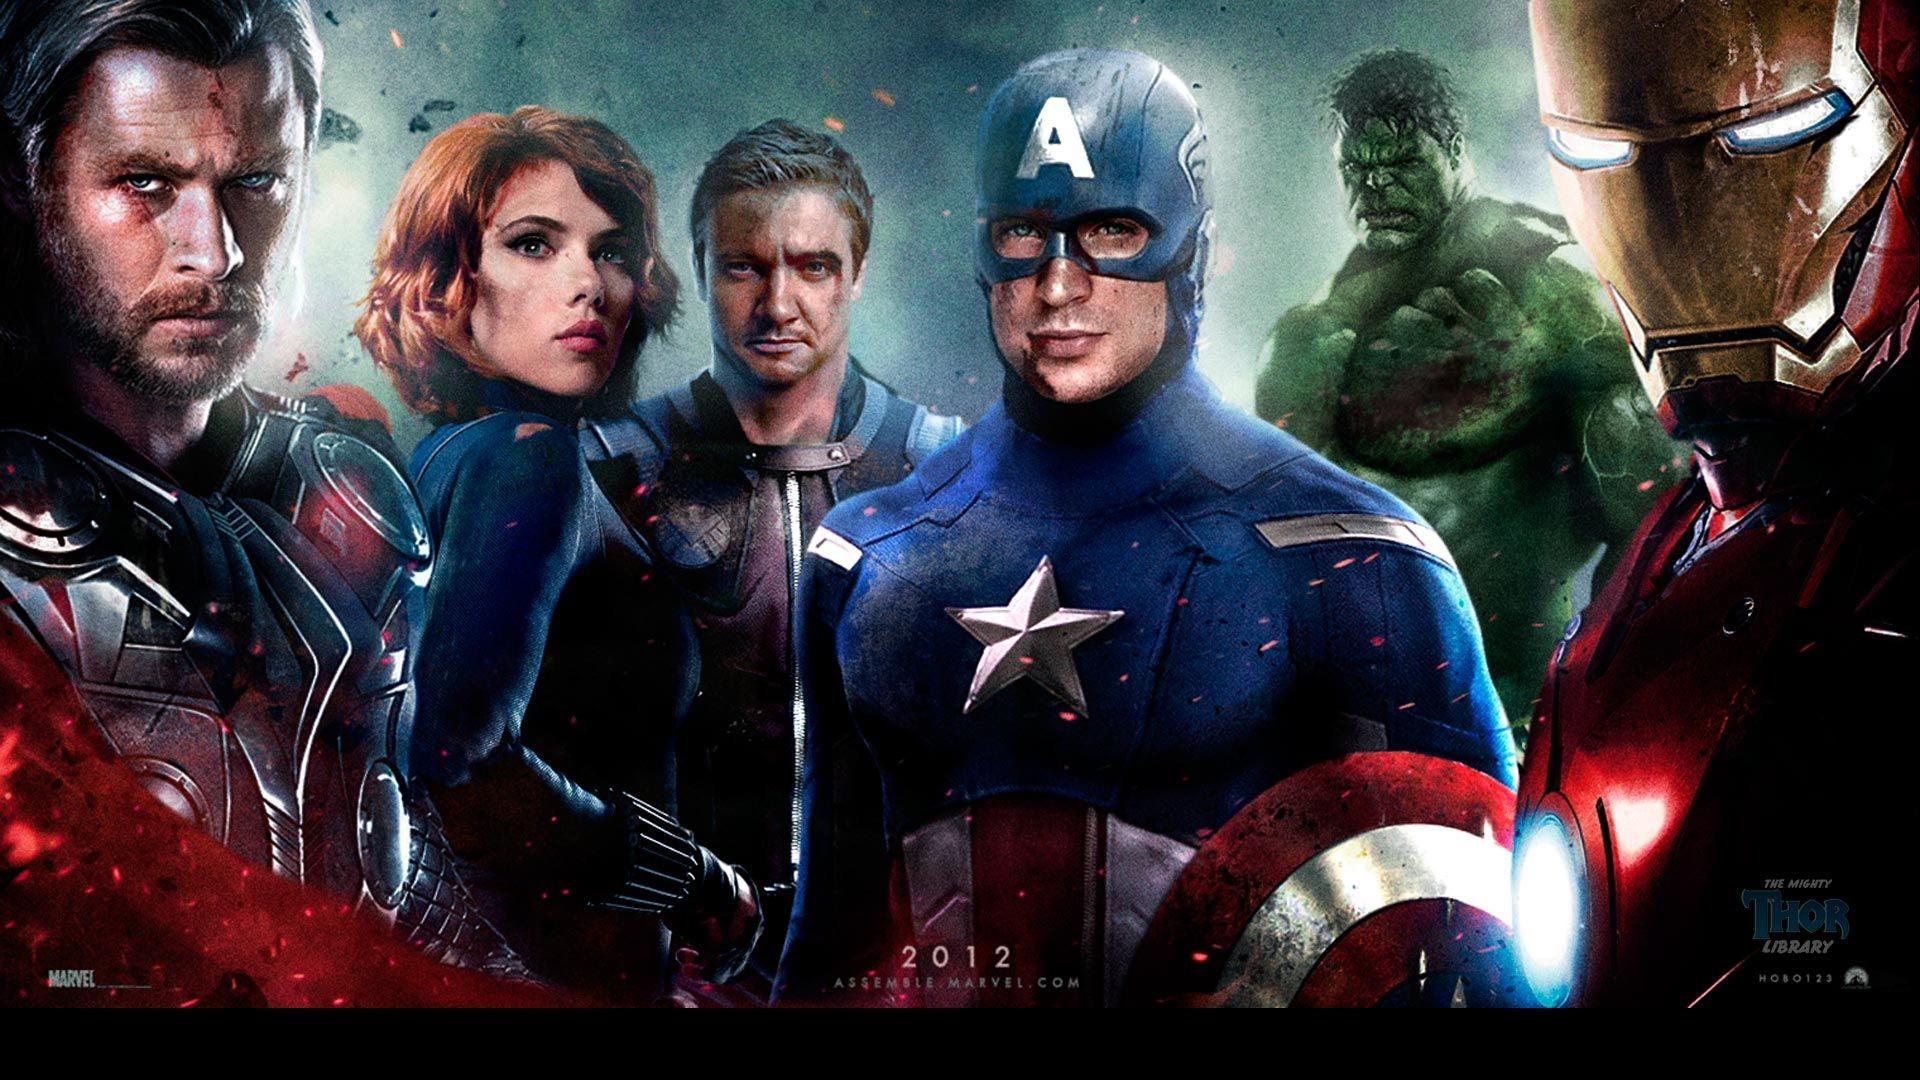 Res: 1920x1080, thor loki sif malekith dark world HD | Avengers Movie Heroes (1920 x 1080)